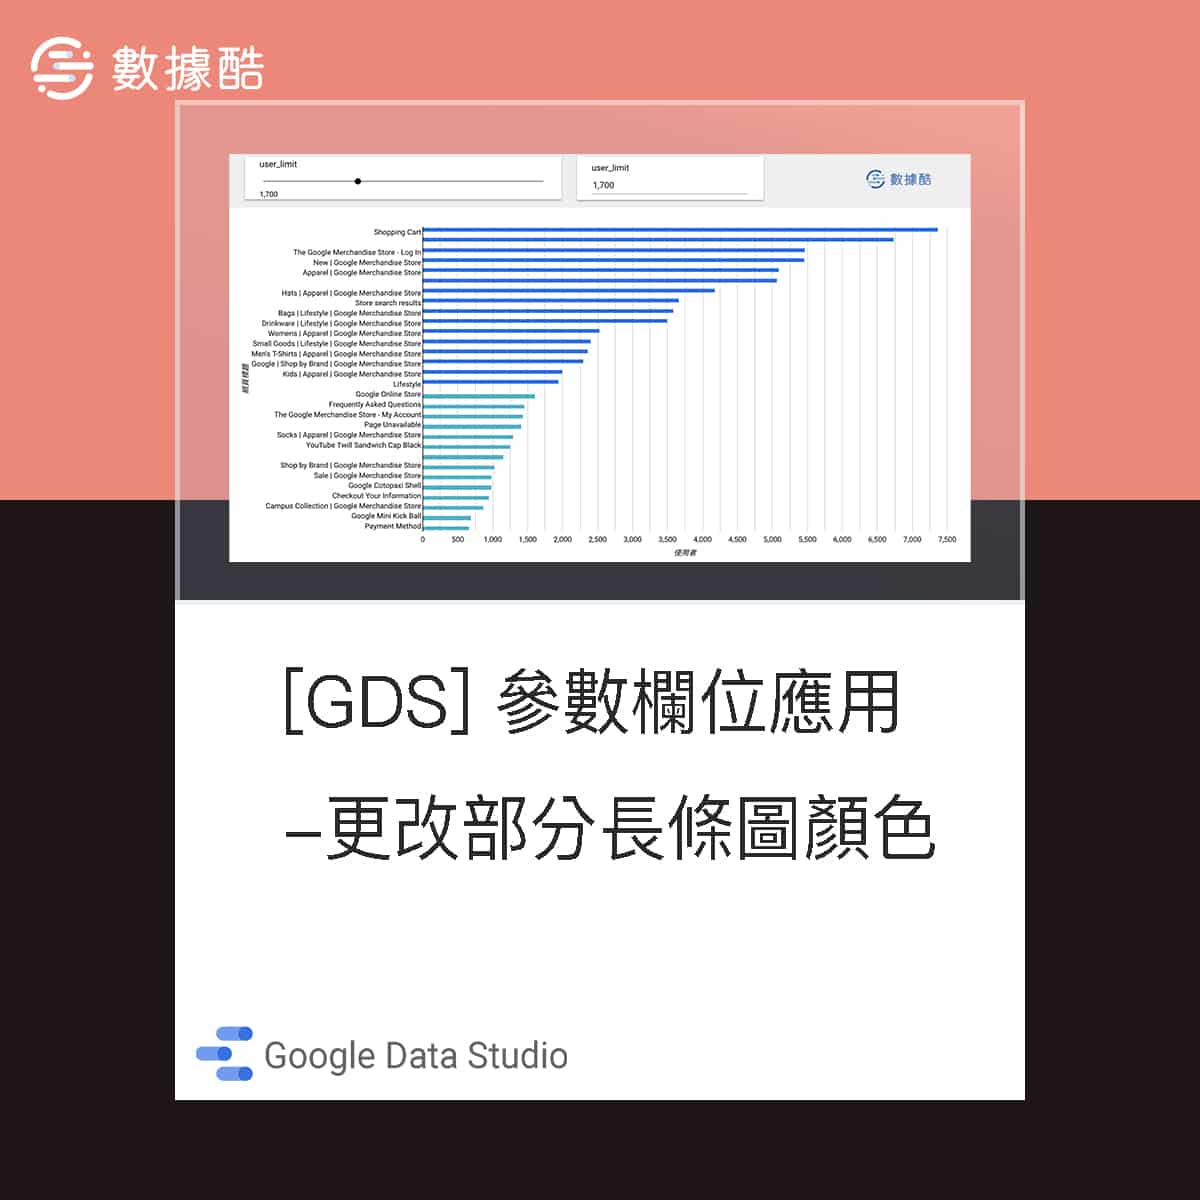 Data Studio 使用參數欄位更改部分長條圖顏色